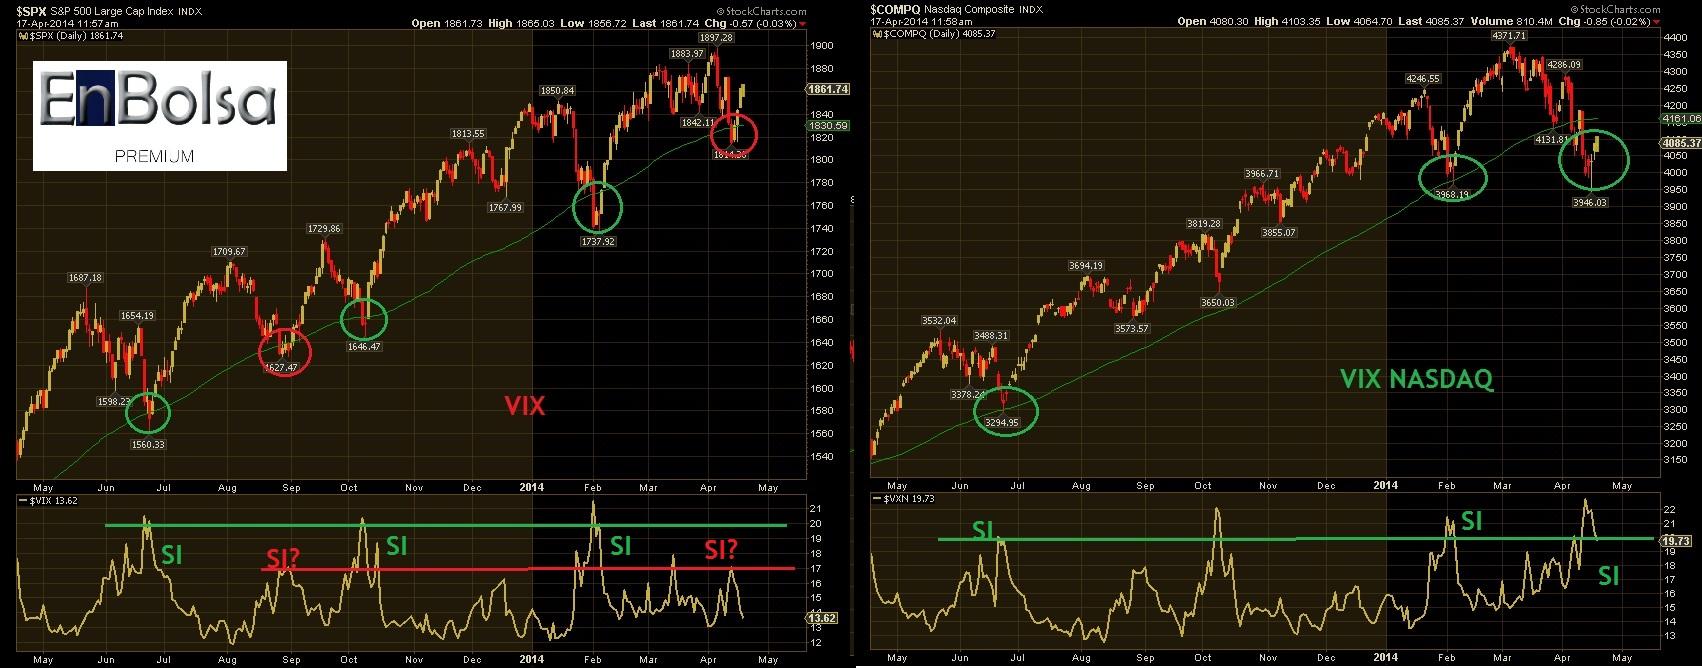 VIX SP Y NASDAQ